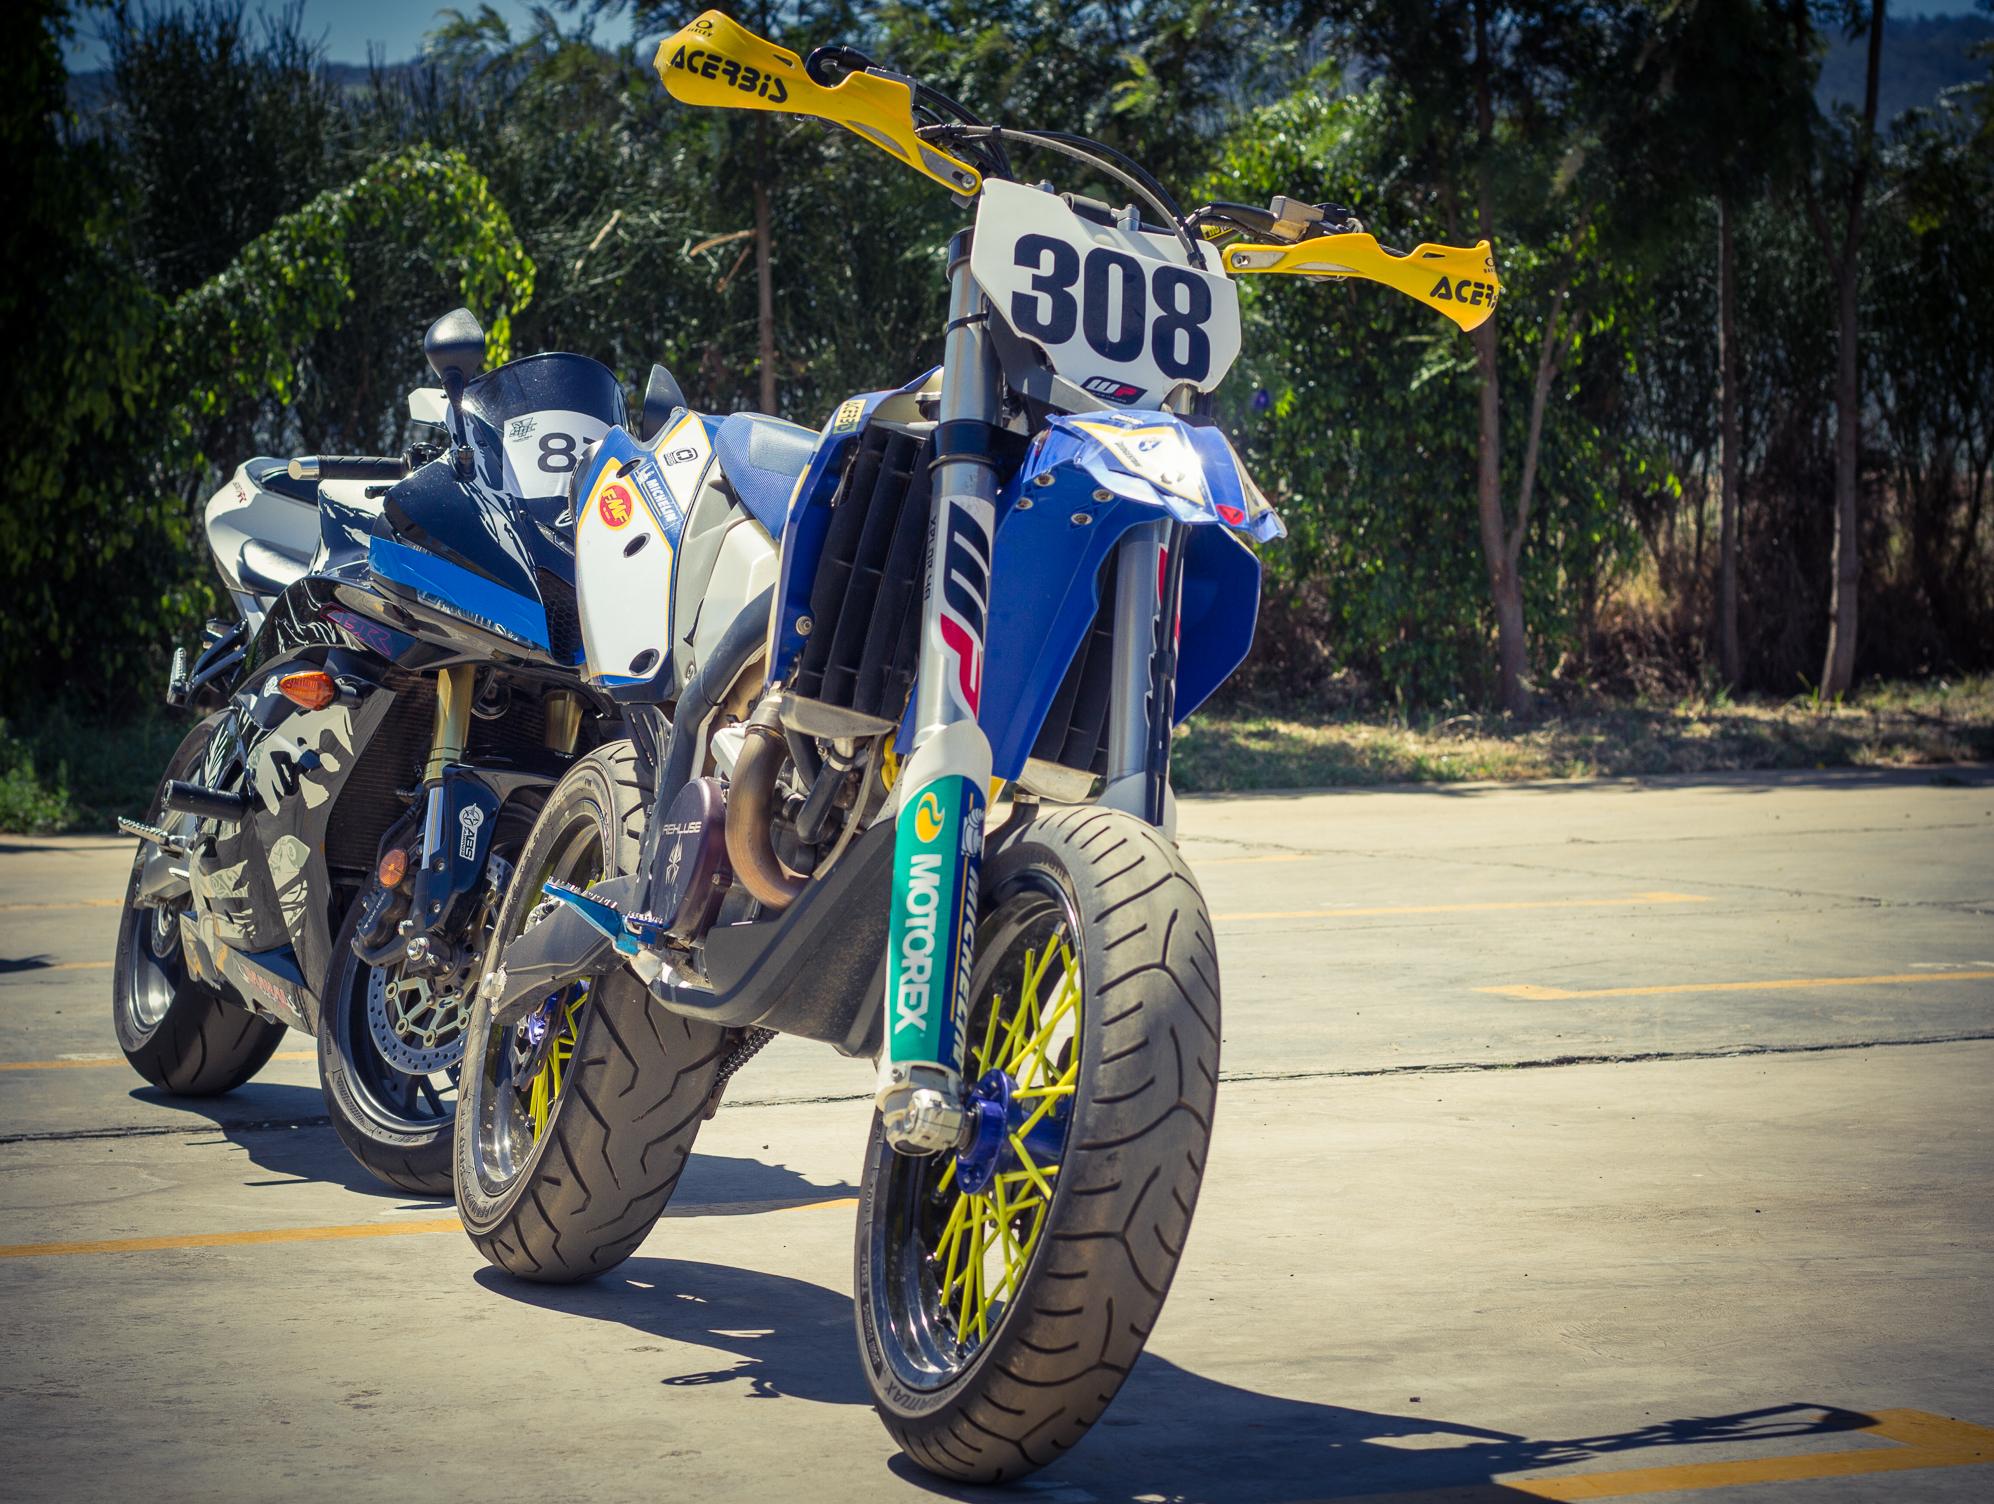 Bikes-1-12.jpg